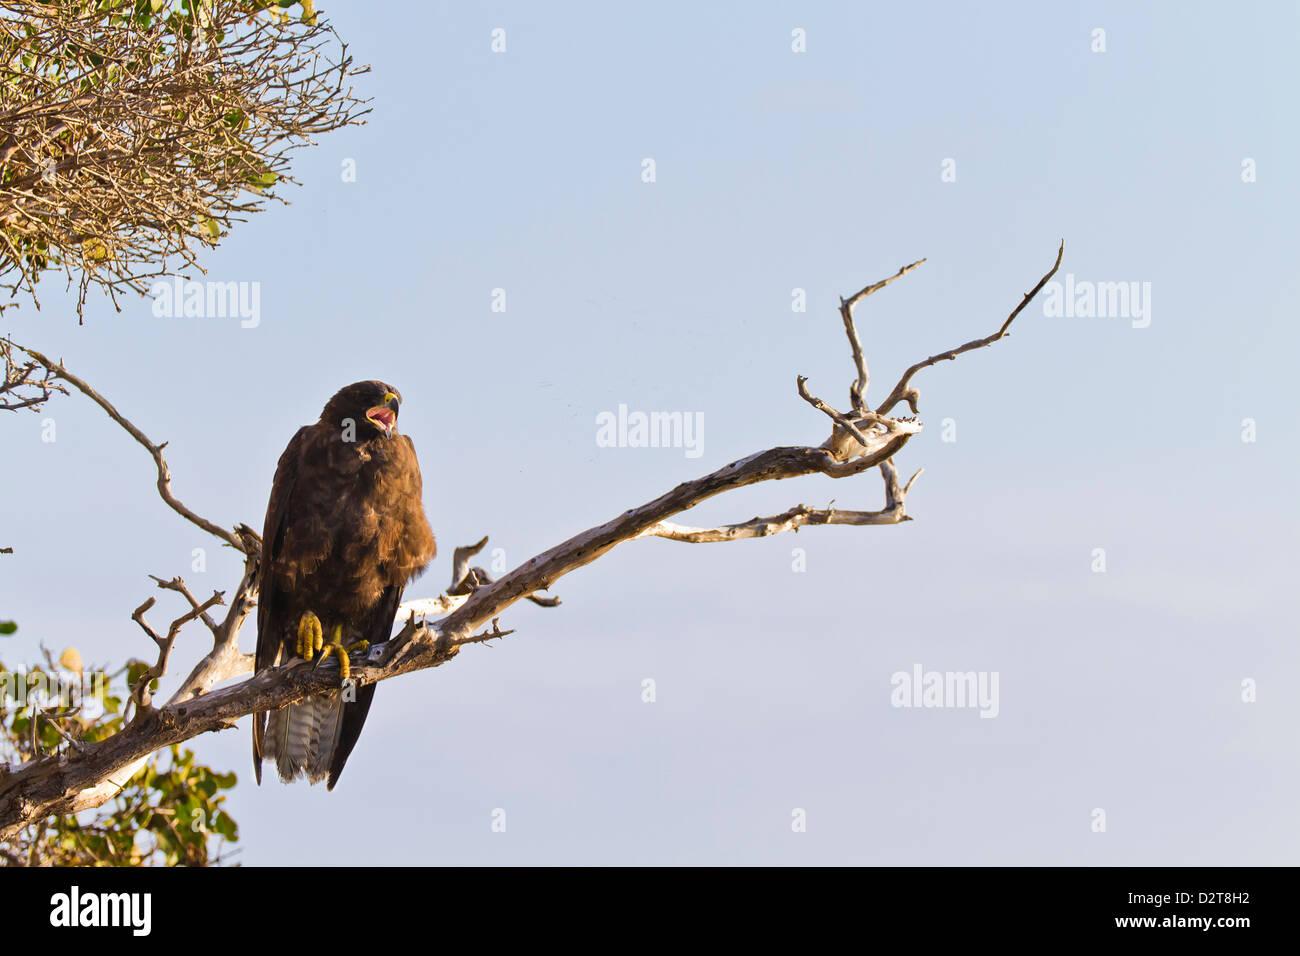 Galapagos hawk (Buteo galapagoensis), Espanola Island, Galapagos Islands, Ecuador, South America - Stock Image